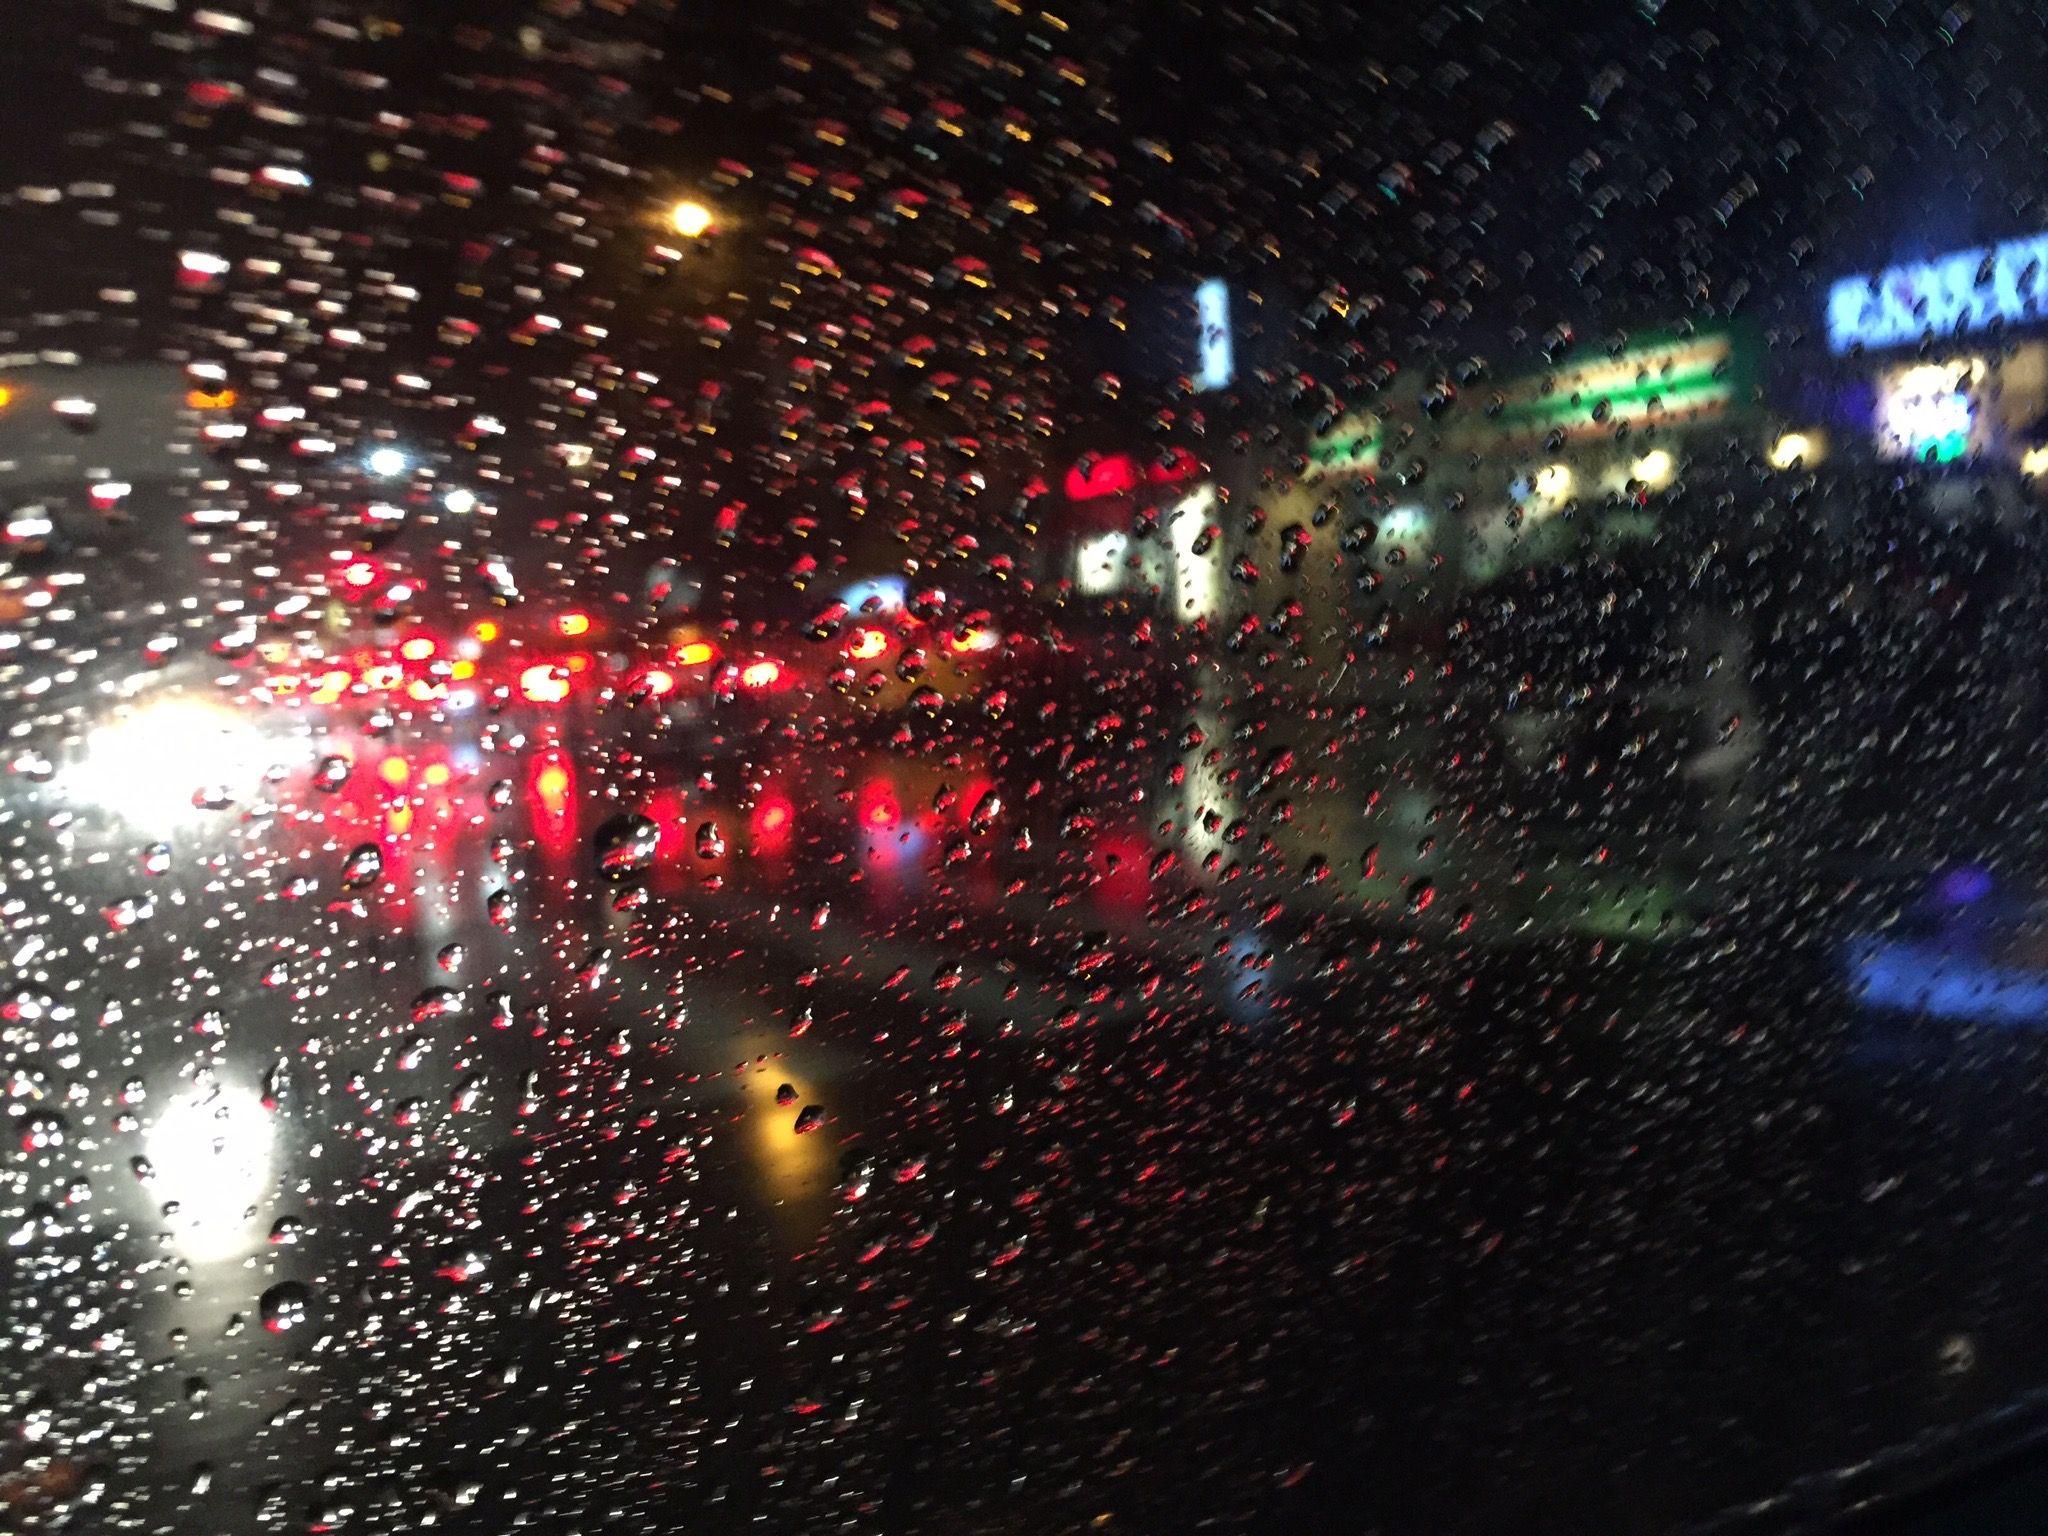 In a raining night